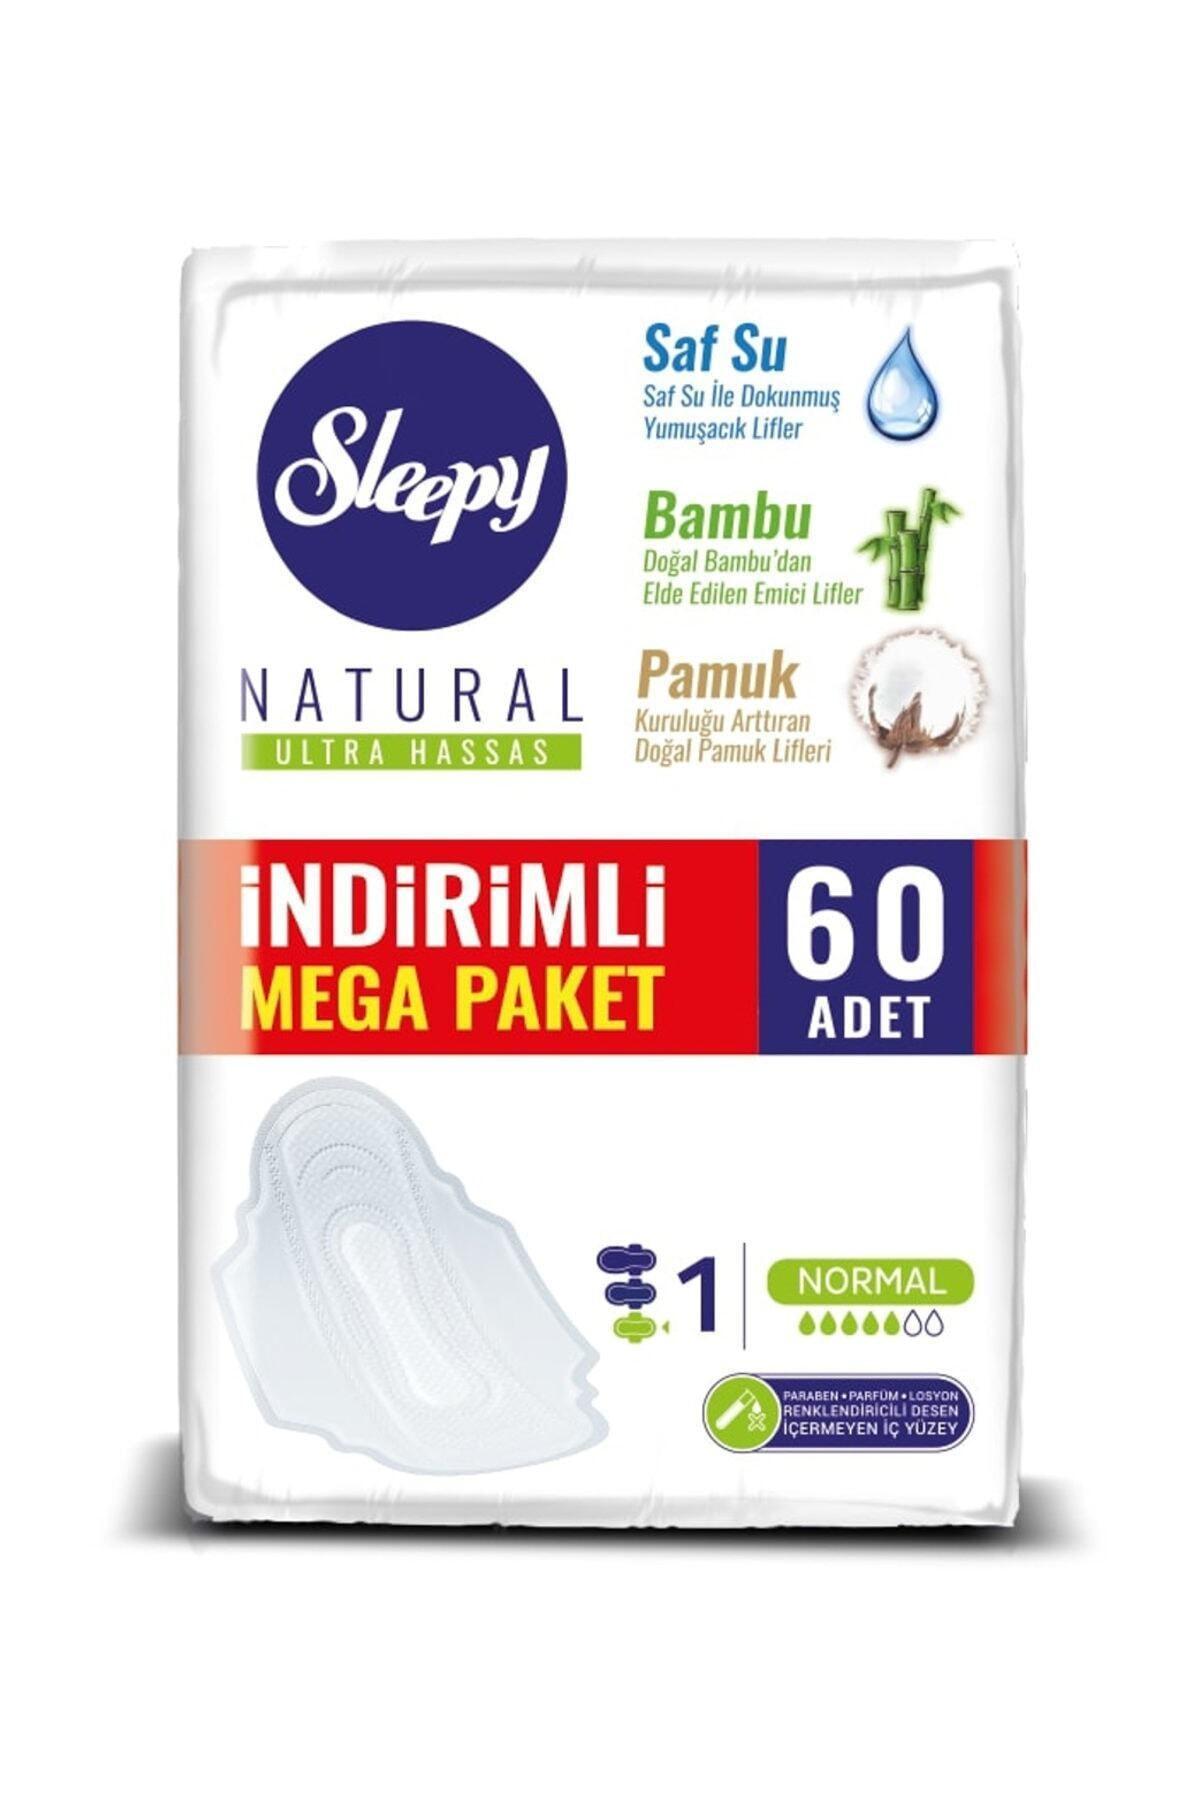 Sleepy Hijyenik Ped Natural Ultra Hassas Normal Mega Paketi - 60'lı 1